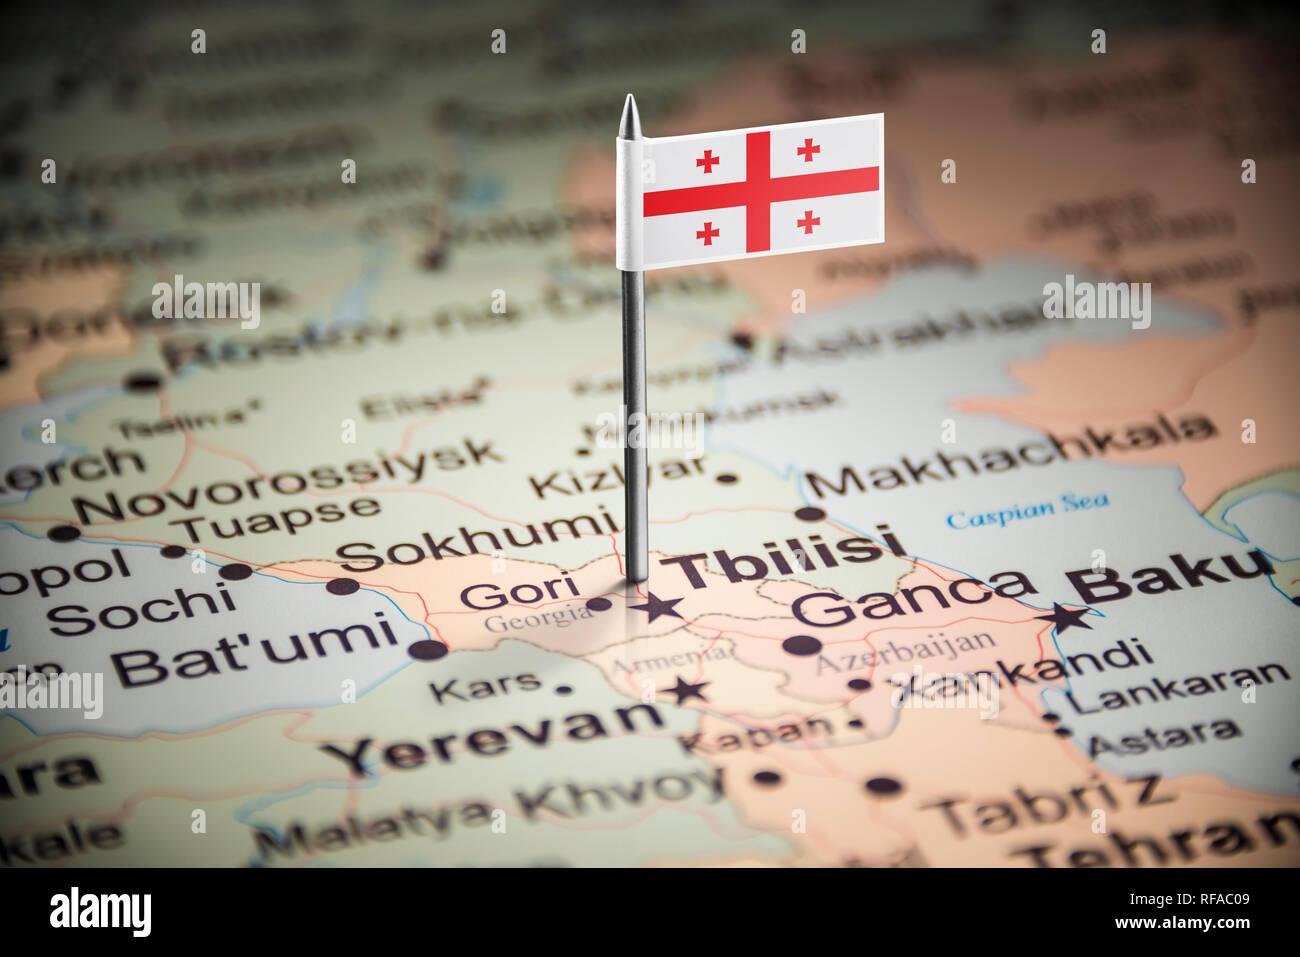 Georgia marked with a flag on the map Stock Photo: 233183561 ... on georgia events, georgia usa, georgia on the globe, georgia state, georgia maps cities in us, massachusetts on us map, georgia home, south dakota map, georgia asia, georgia attractions, georgia on the water, kyrgyzstan map, georgia country,